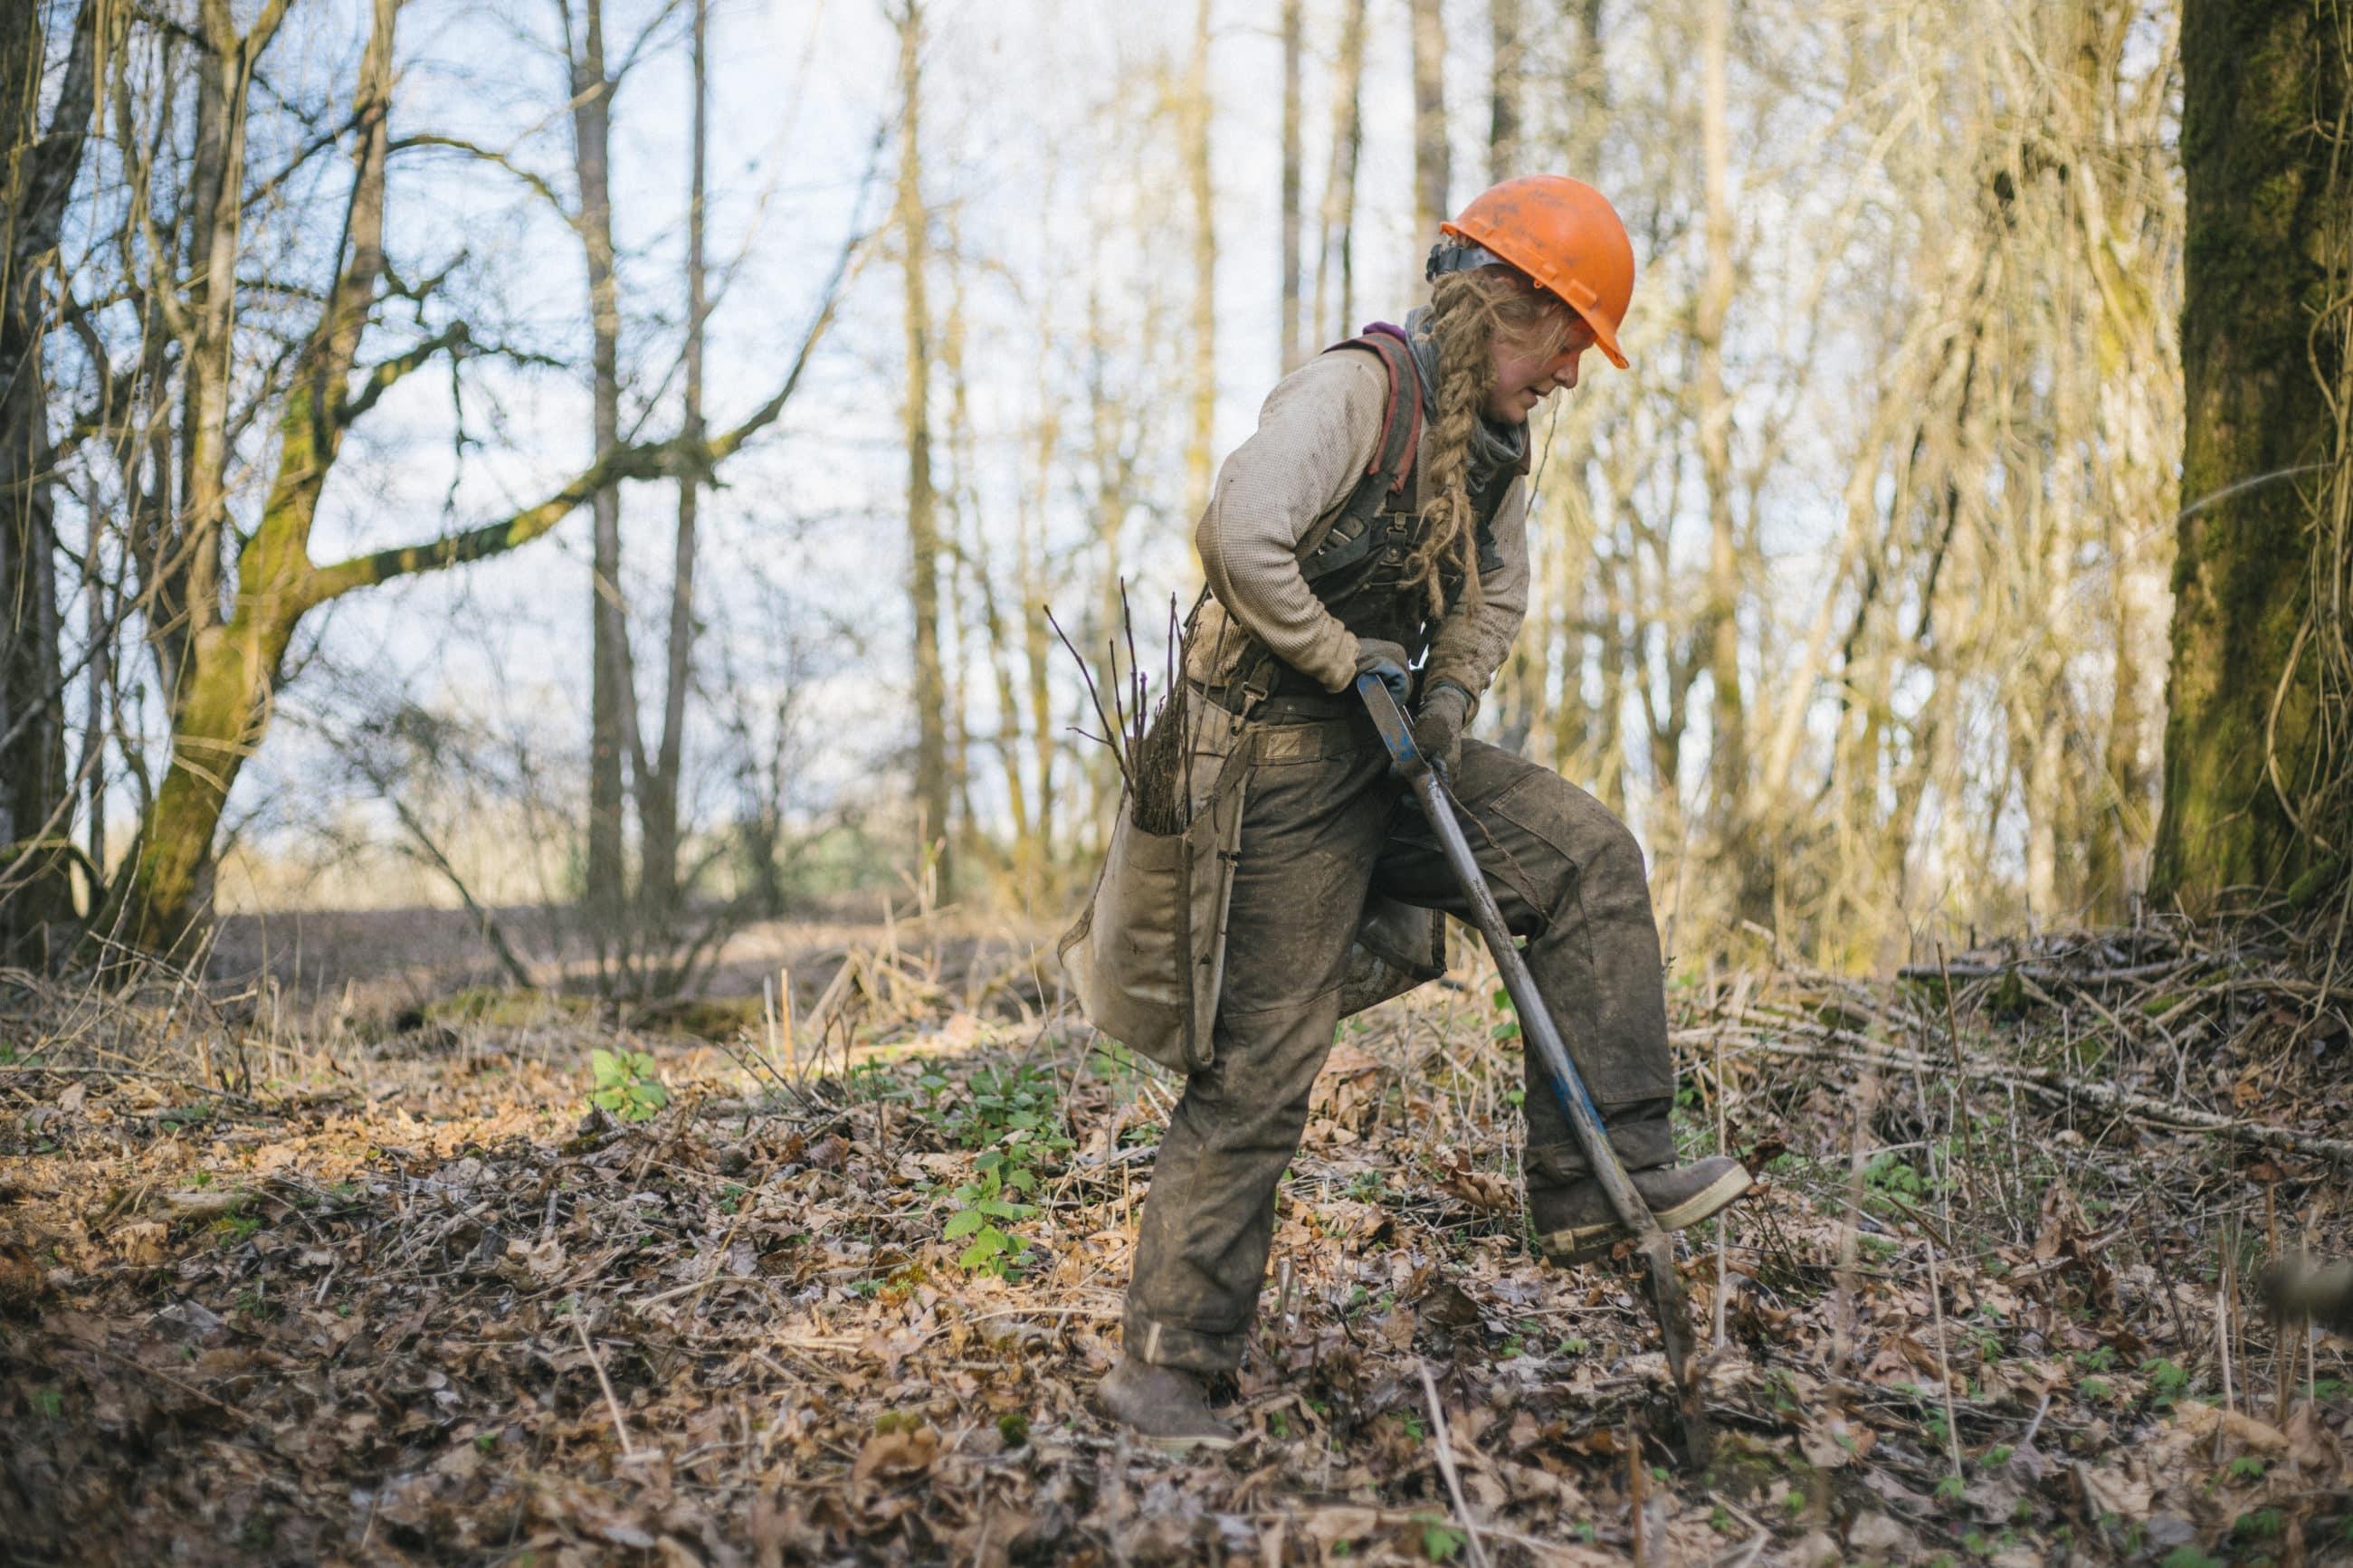 Tree planter digging a hole